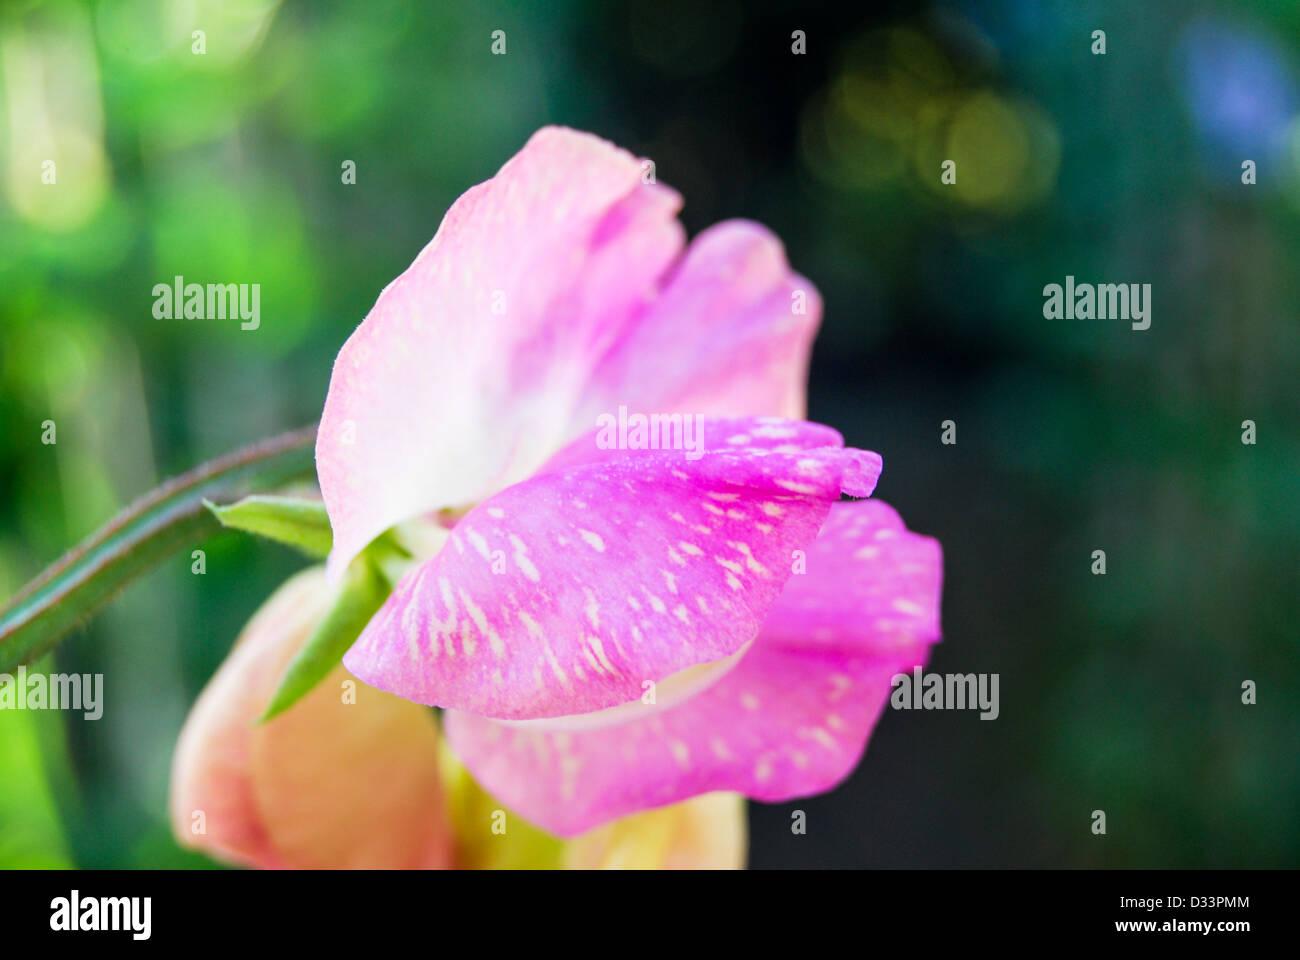 Sweet pea flower showing virus - Stock Image